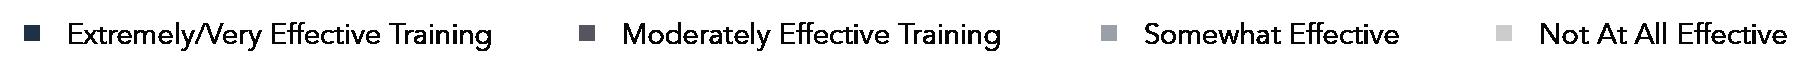 Sales Training Effectiveness Key